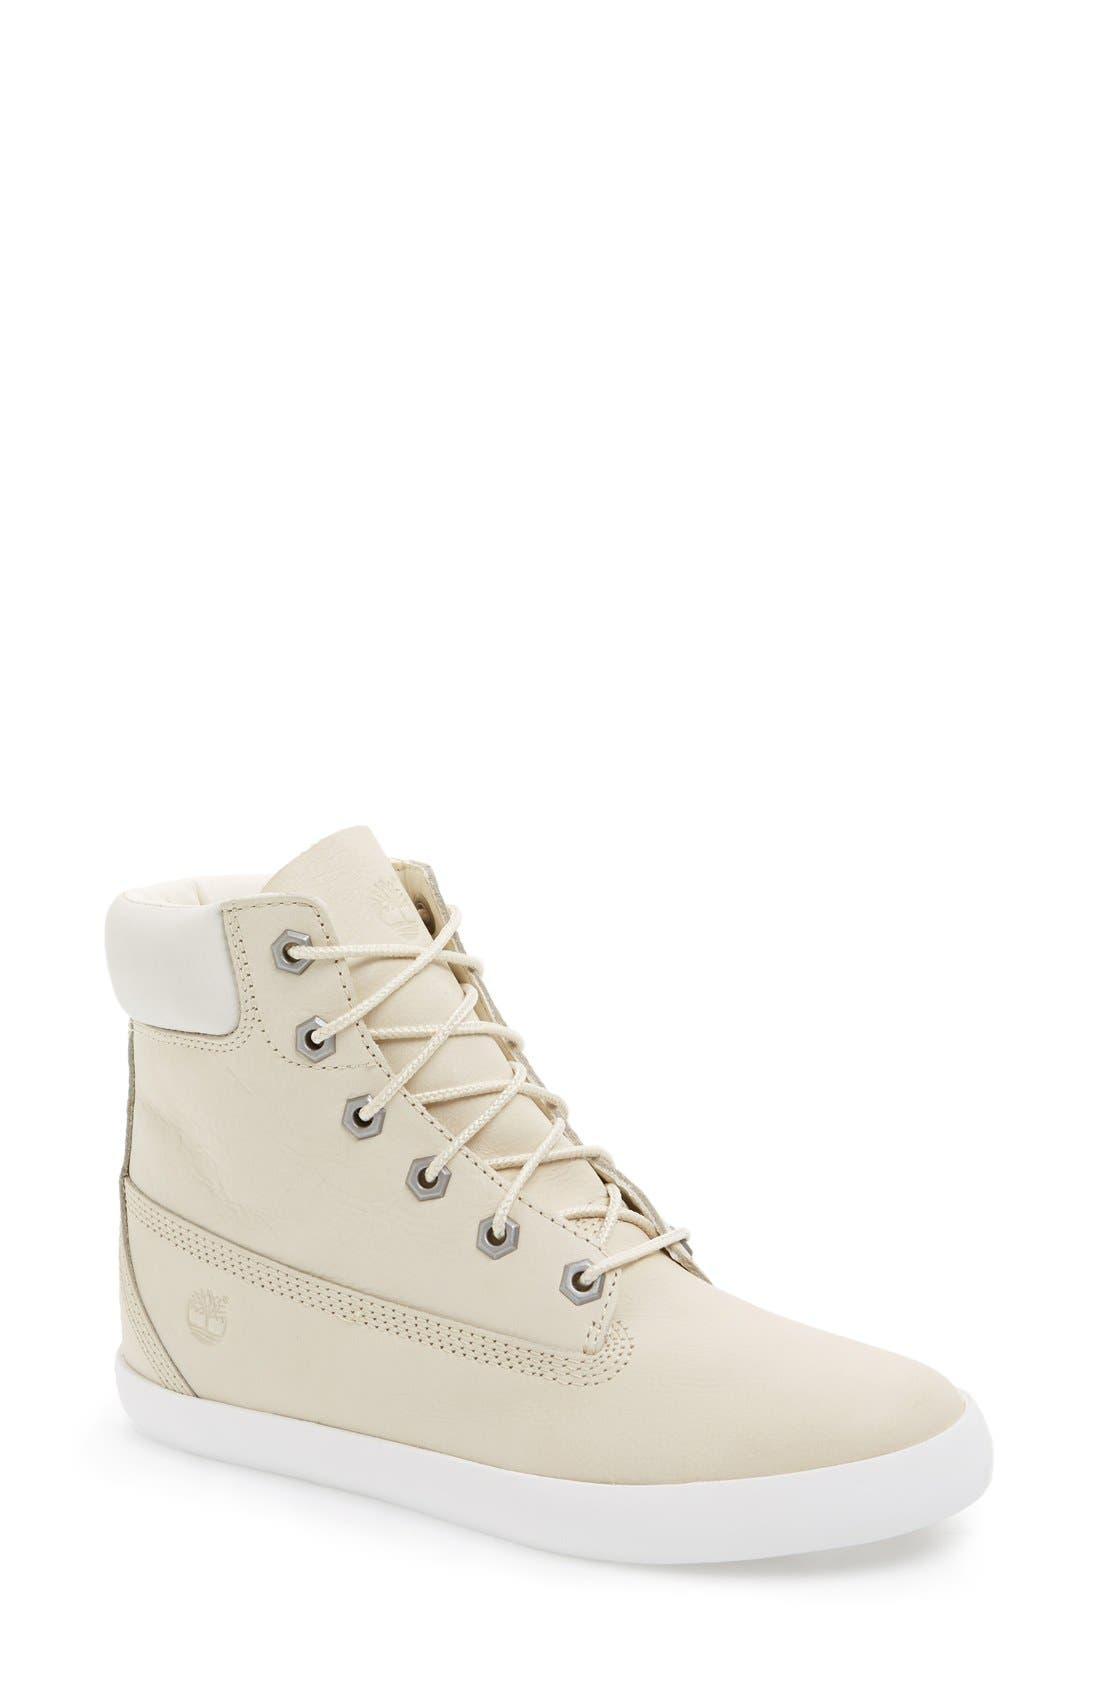 'Glastonbury Six Inch' Sneaker,                             Main thumbnail 1, color,                             Bone Leather